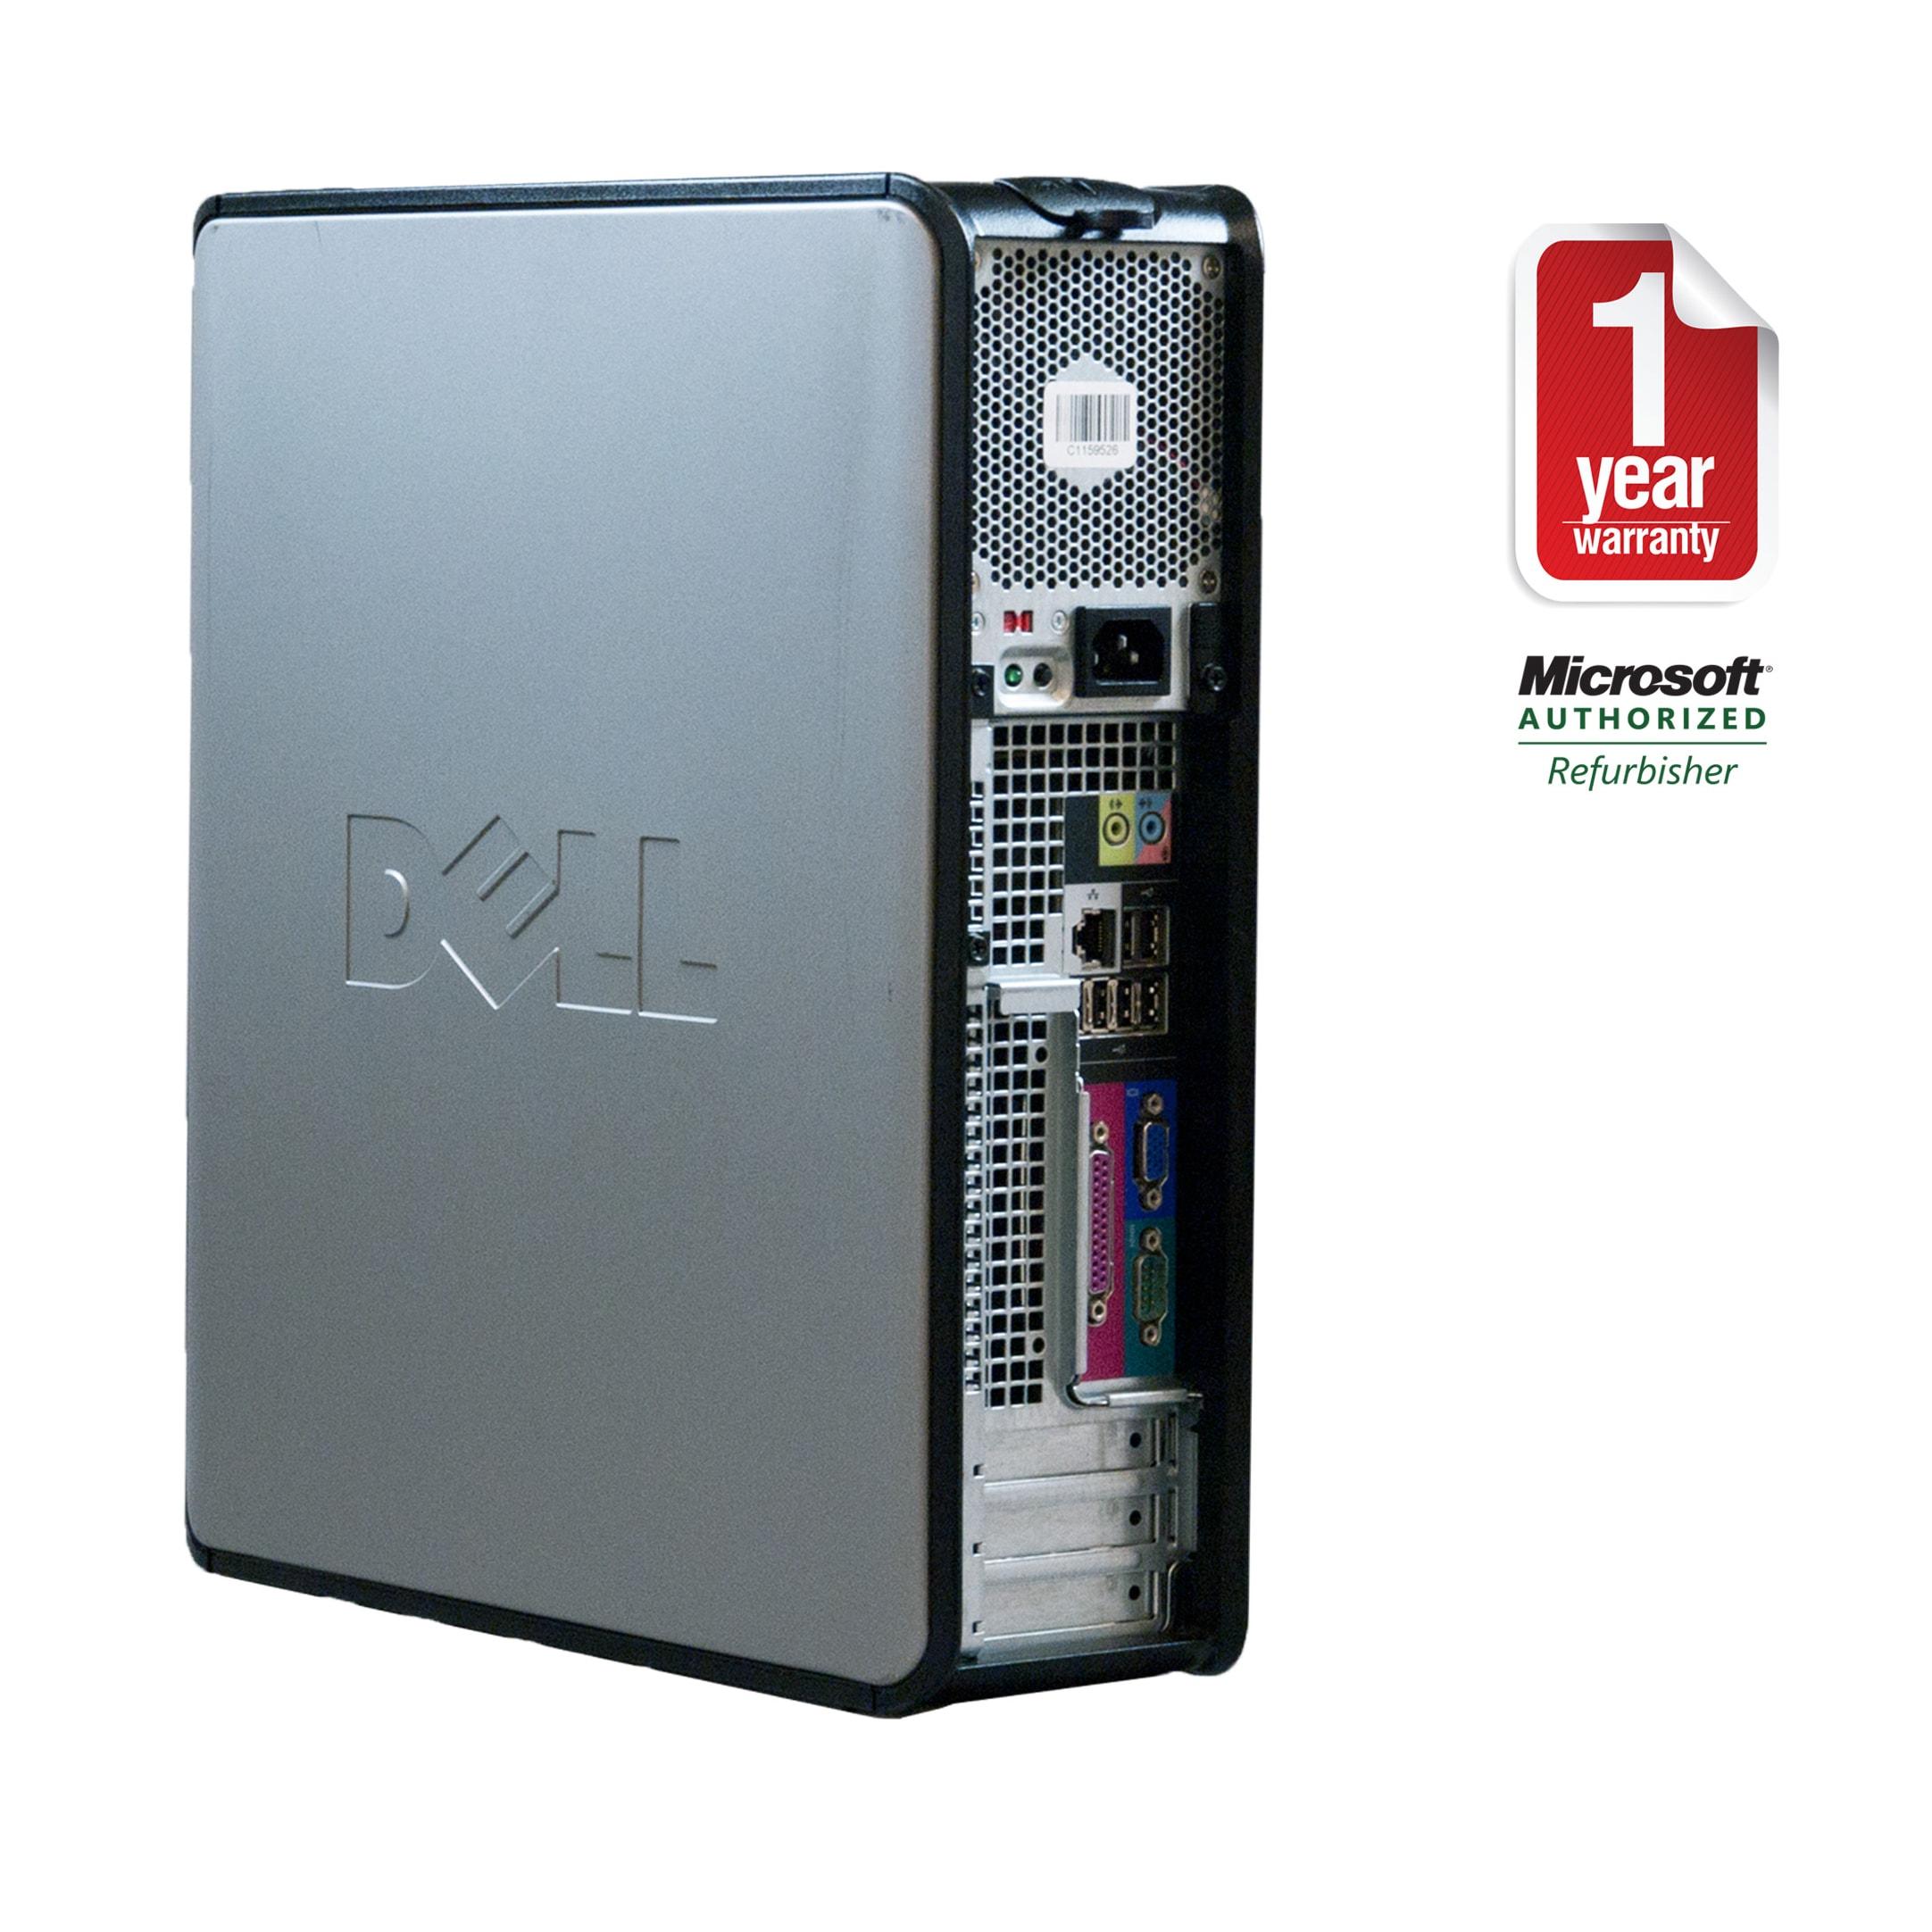 Dell Optiplex 360 Intel Core 2 Duo 2 8GHz CPU 2GB RAM 160GB HDD Windows 10  Home Desktop Computer (Refurbished)